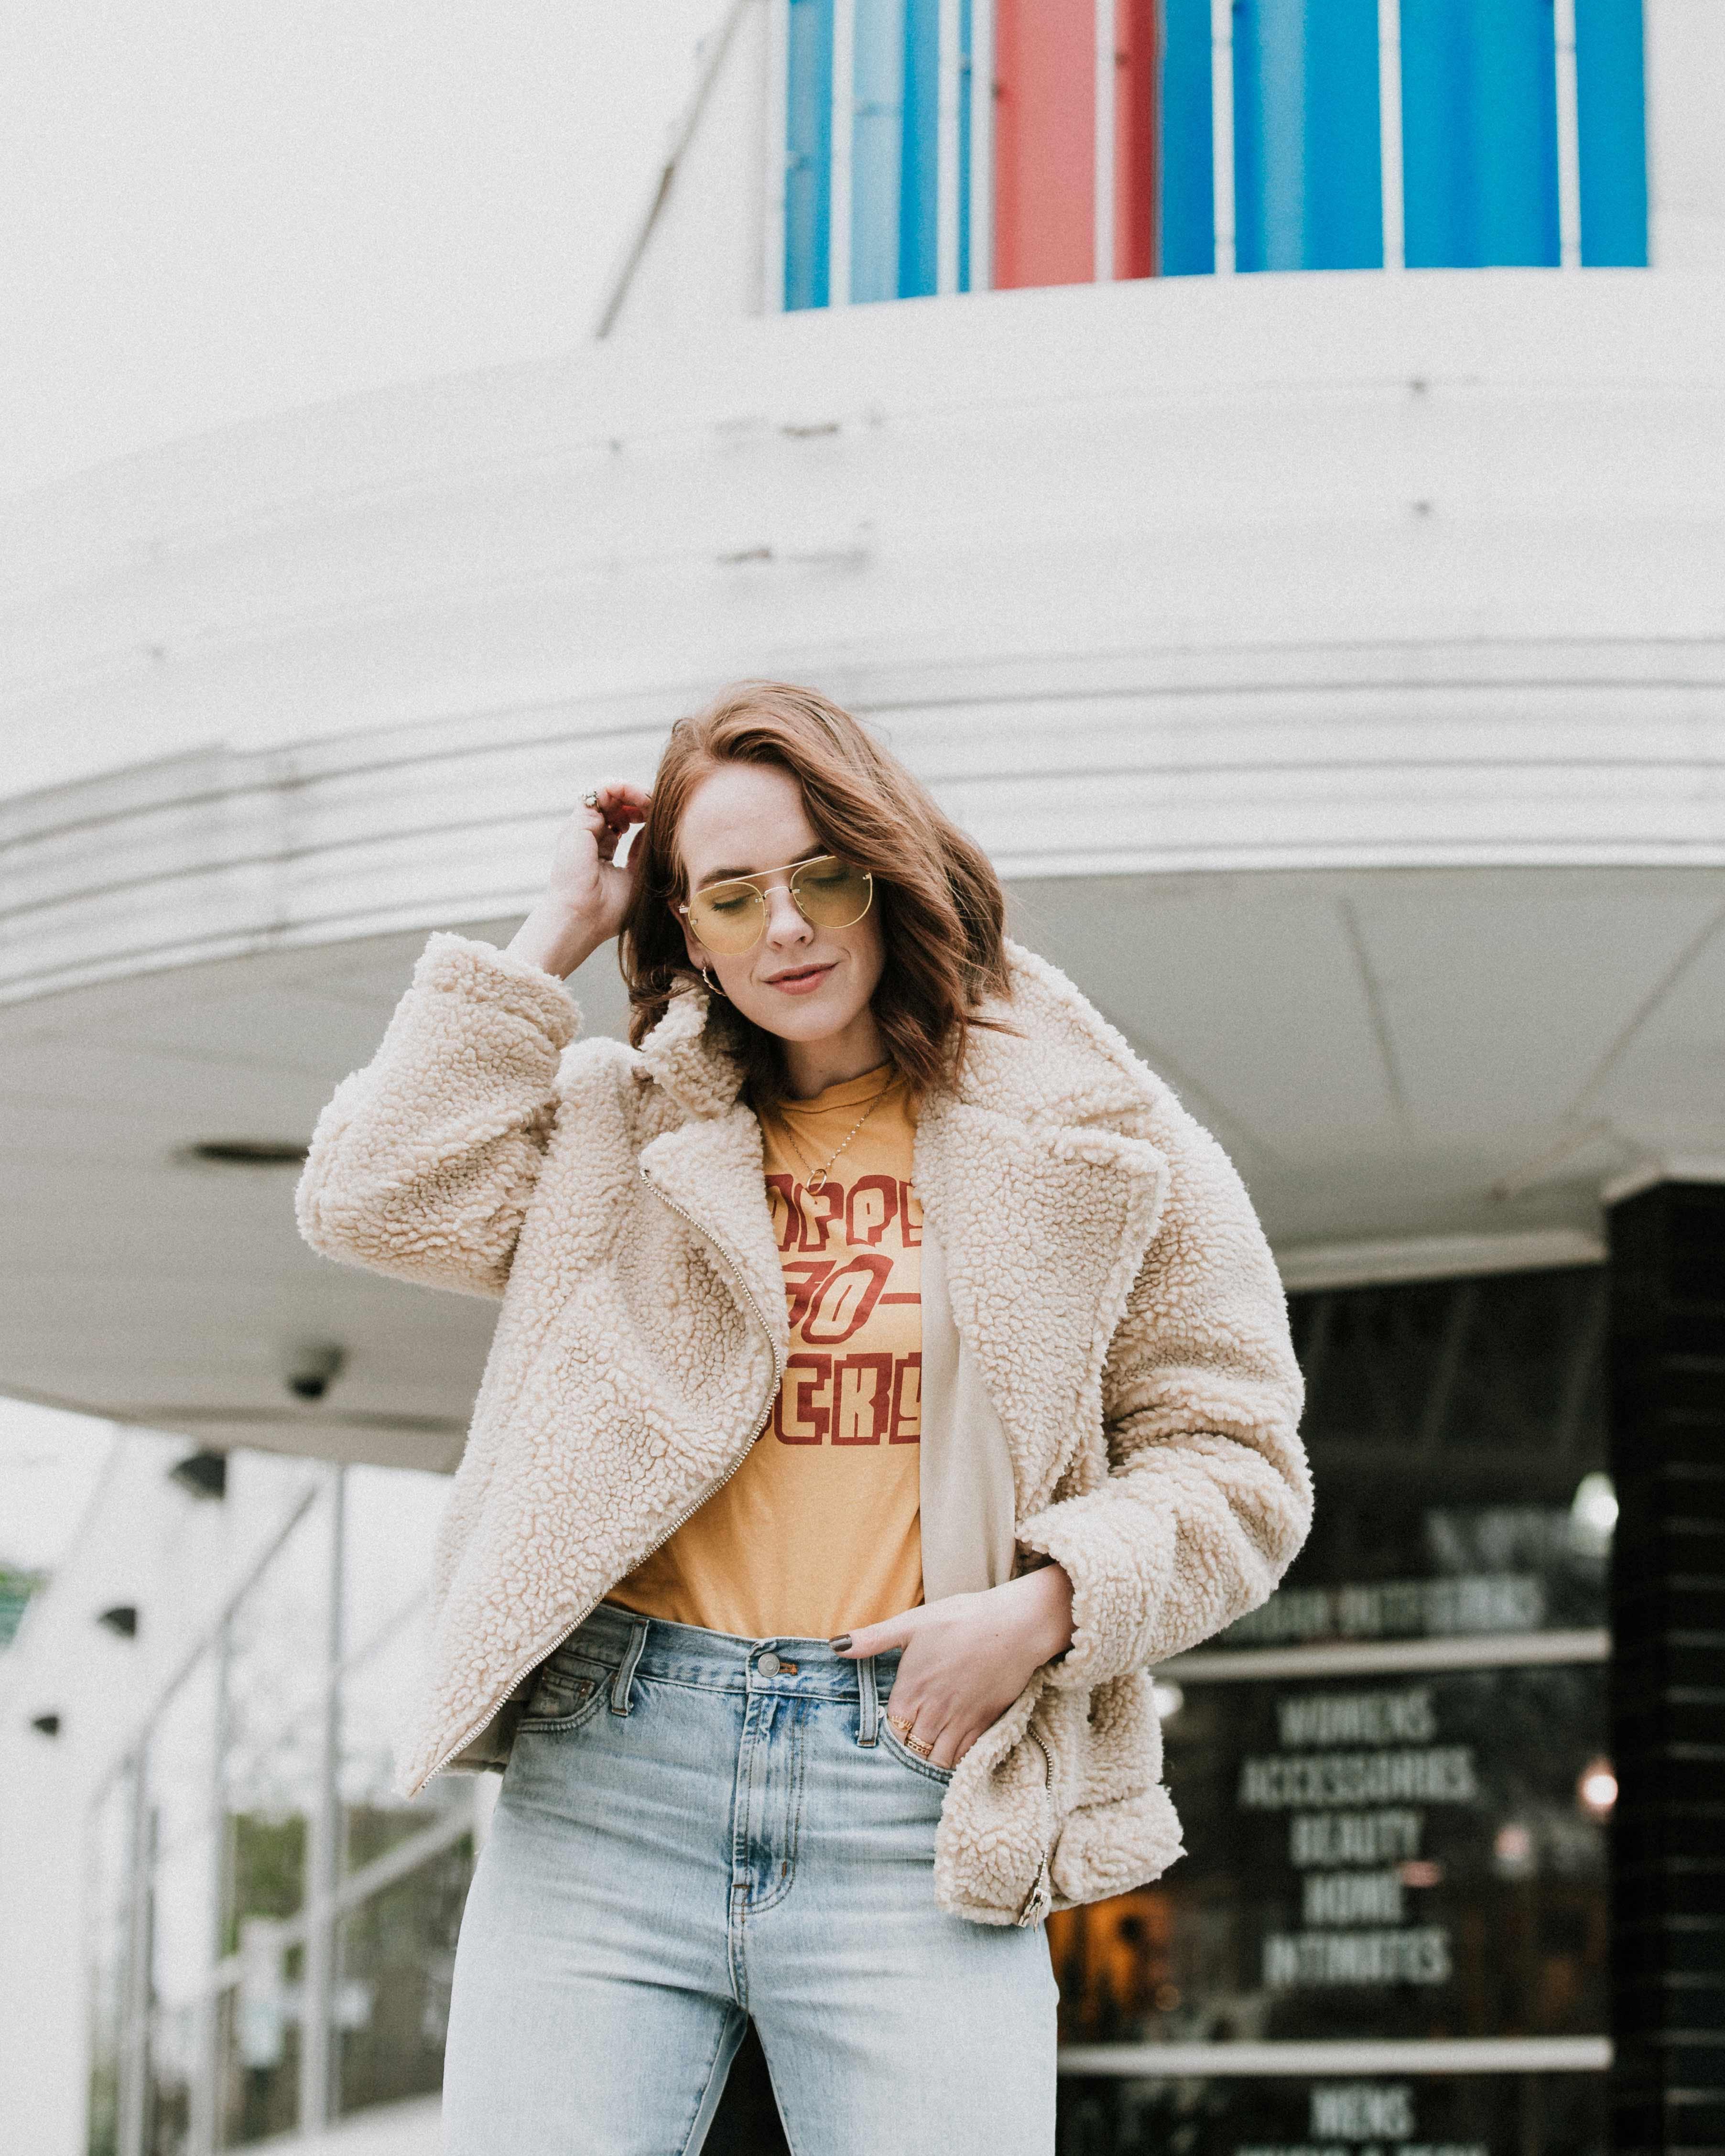 woman wearing brown fur jacket shriveling her hair ]